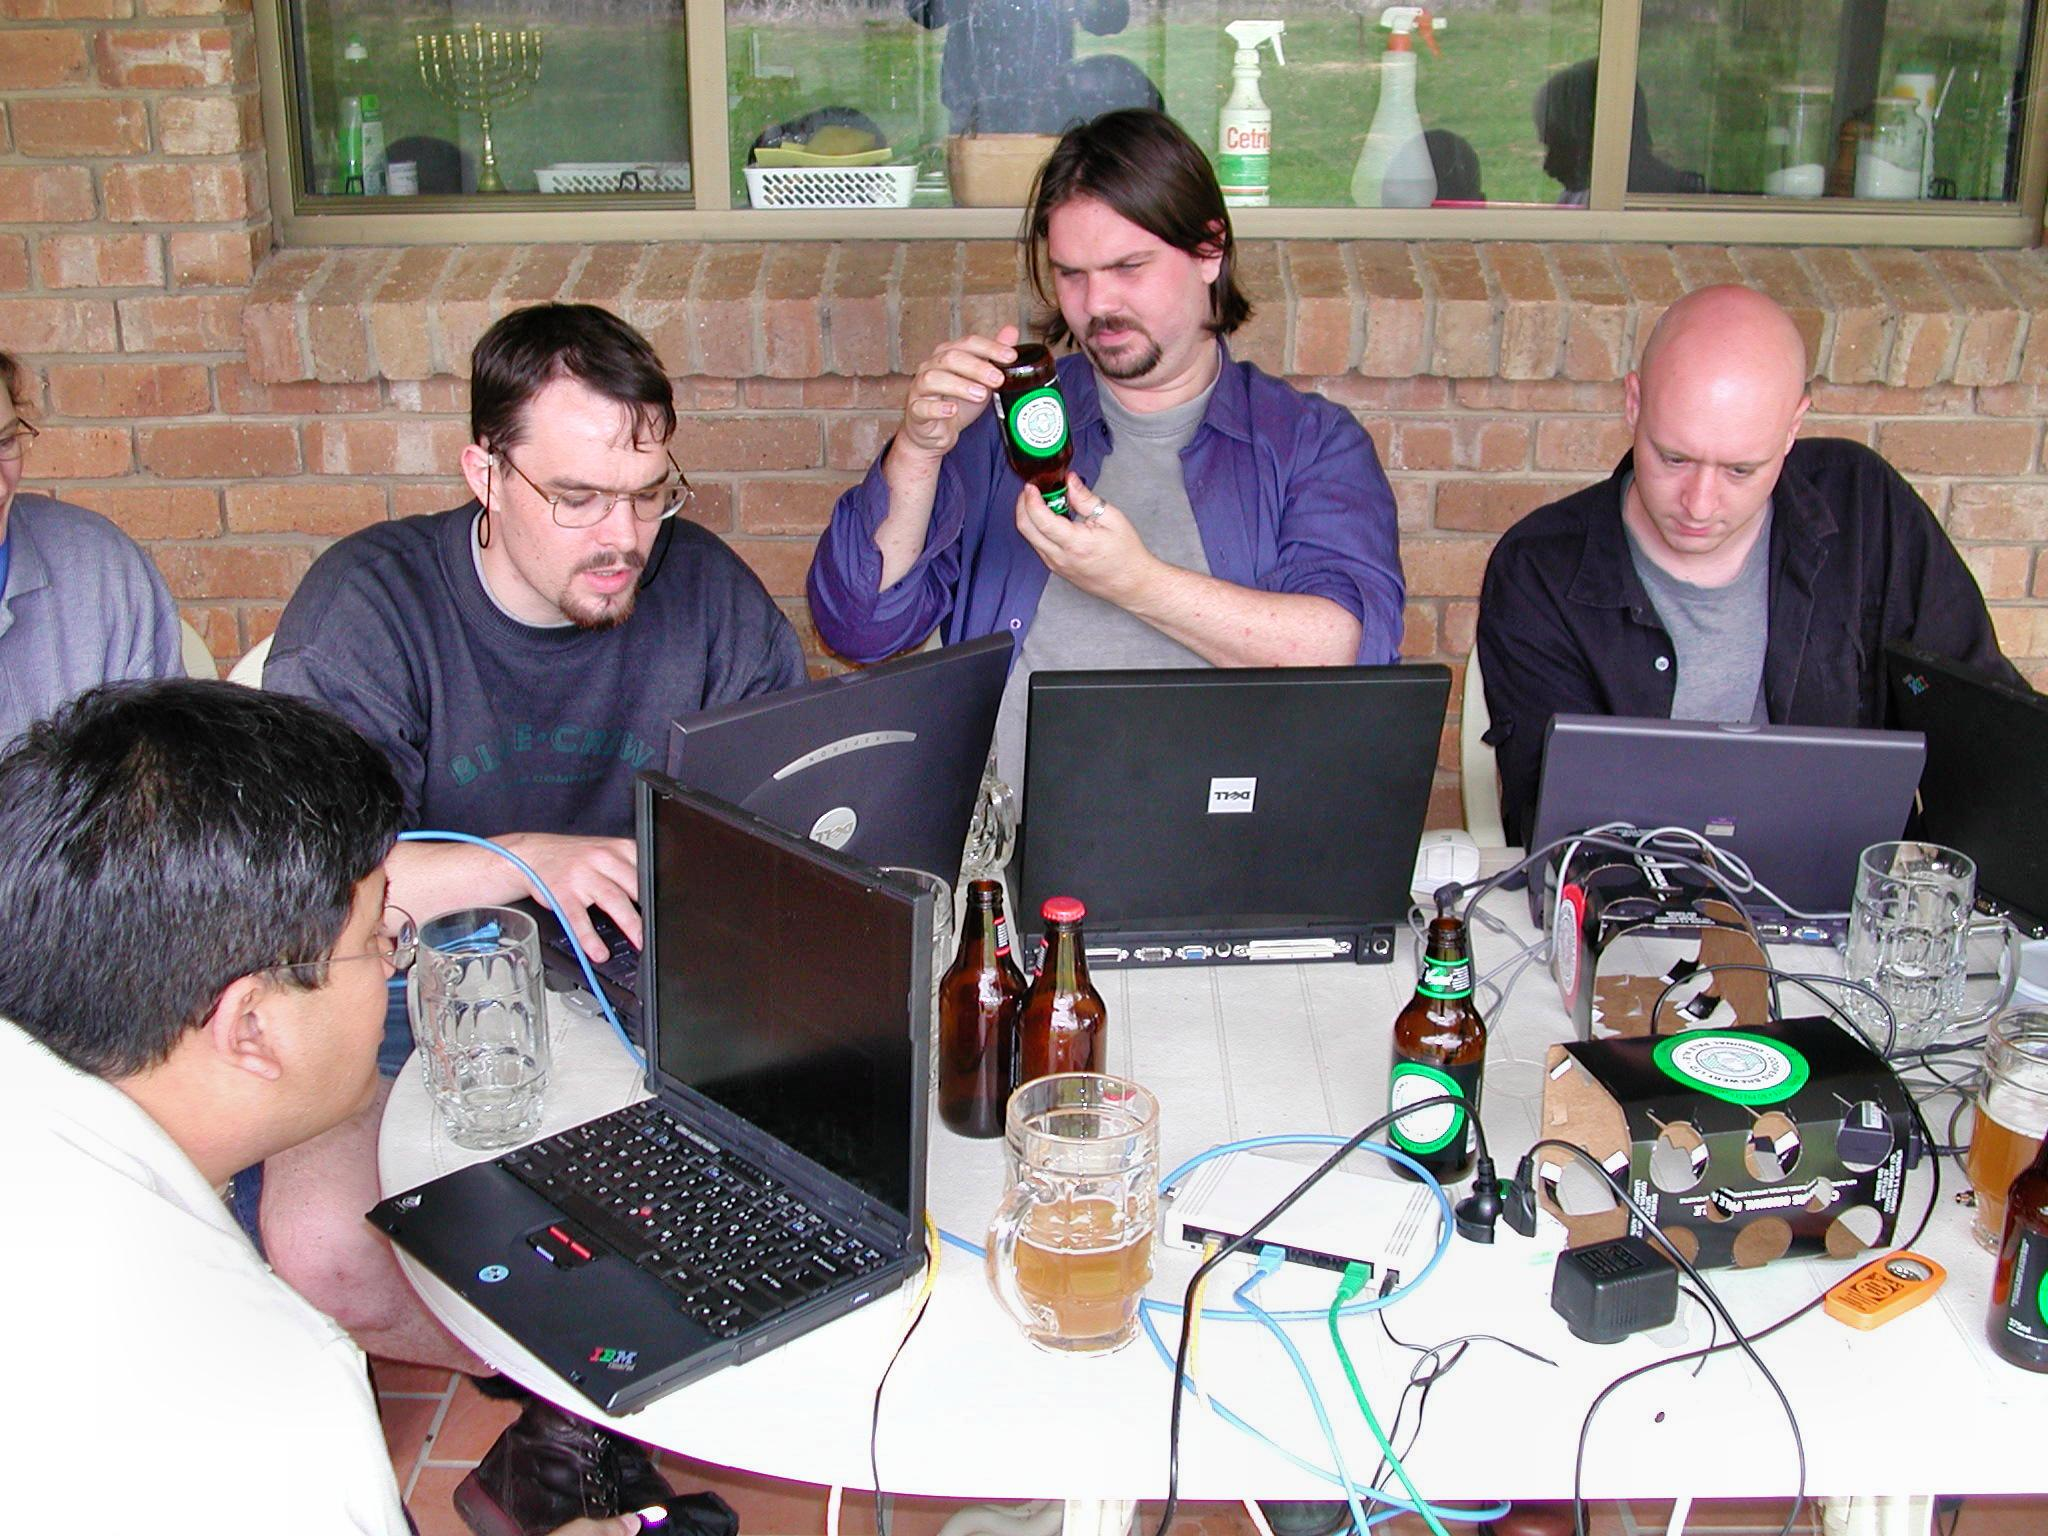 hackers-83.jpeg